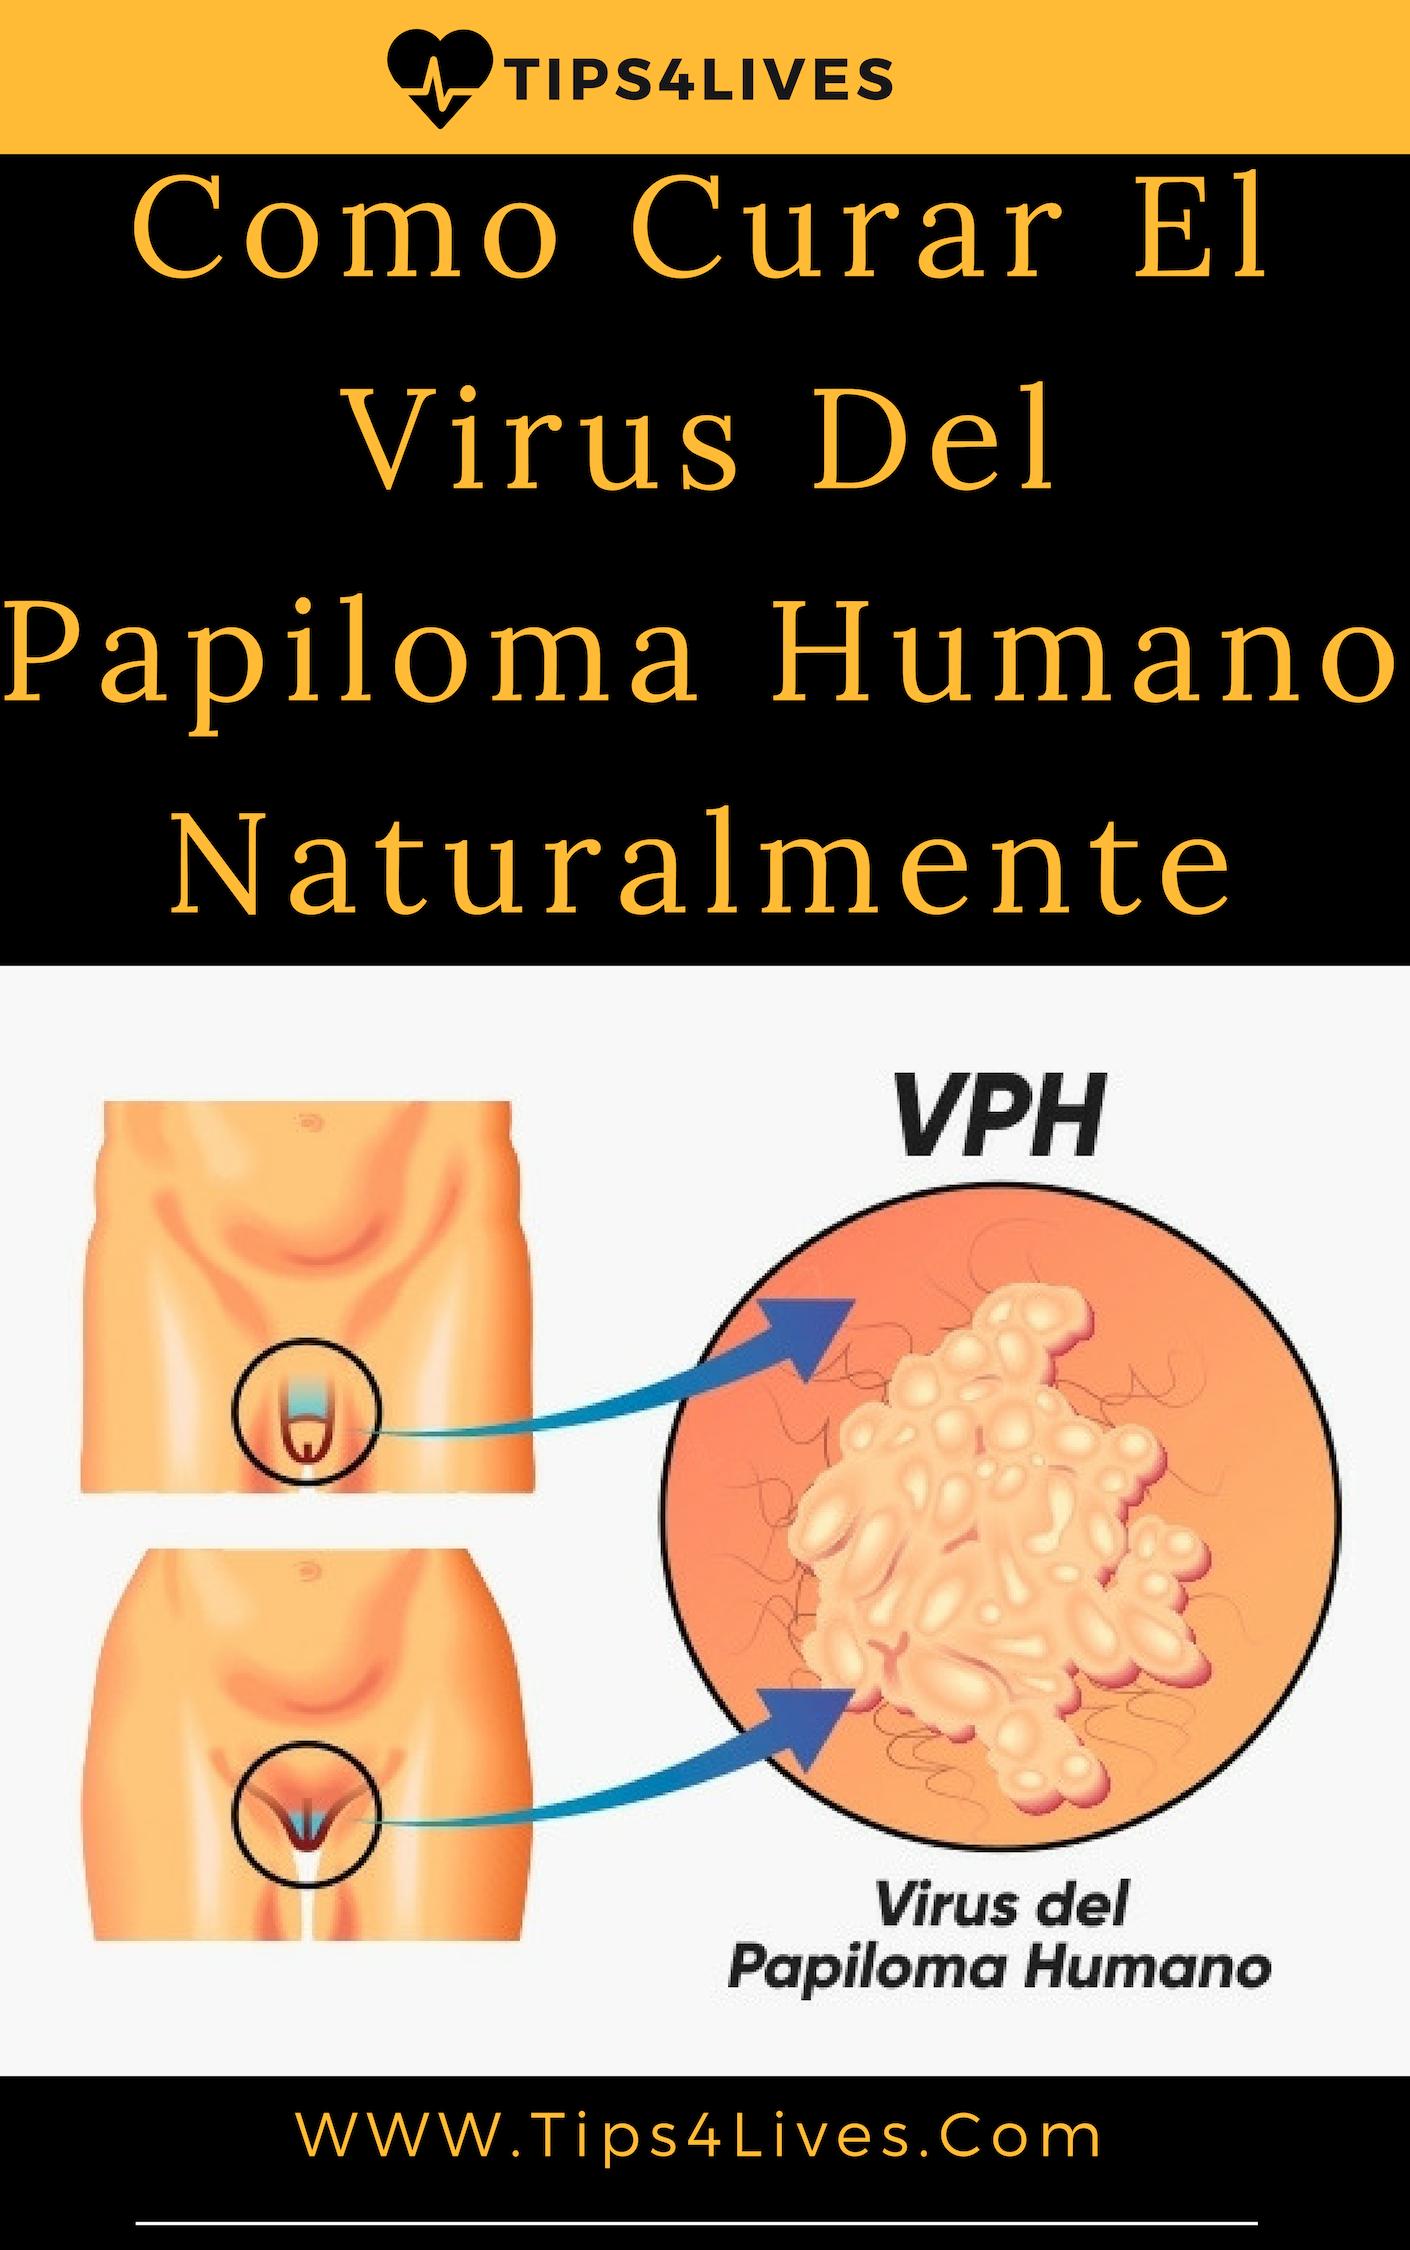 papiloma humano tiene tratamiento cancer epidermoide orofaringe